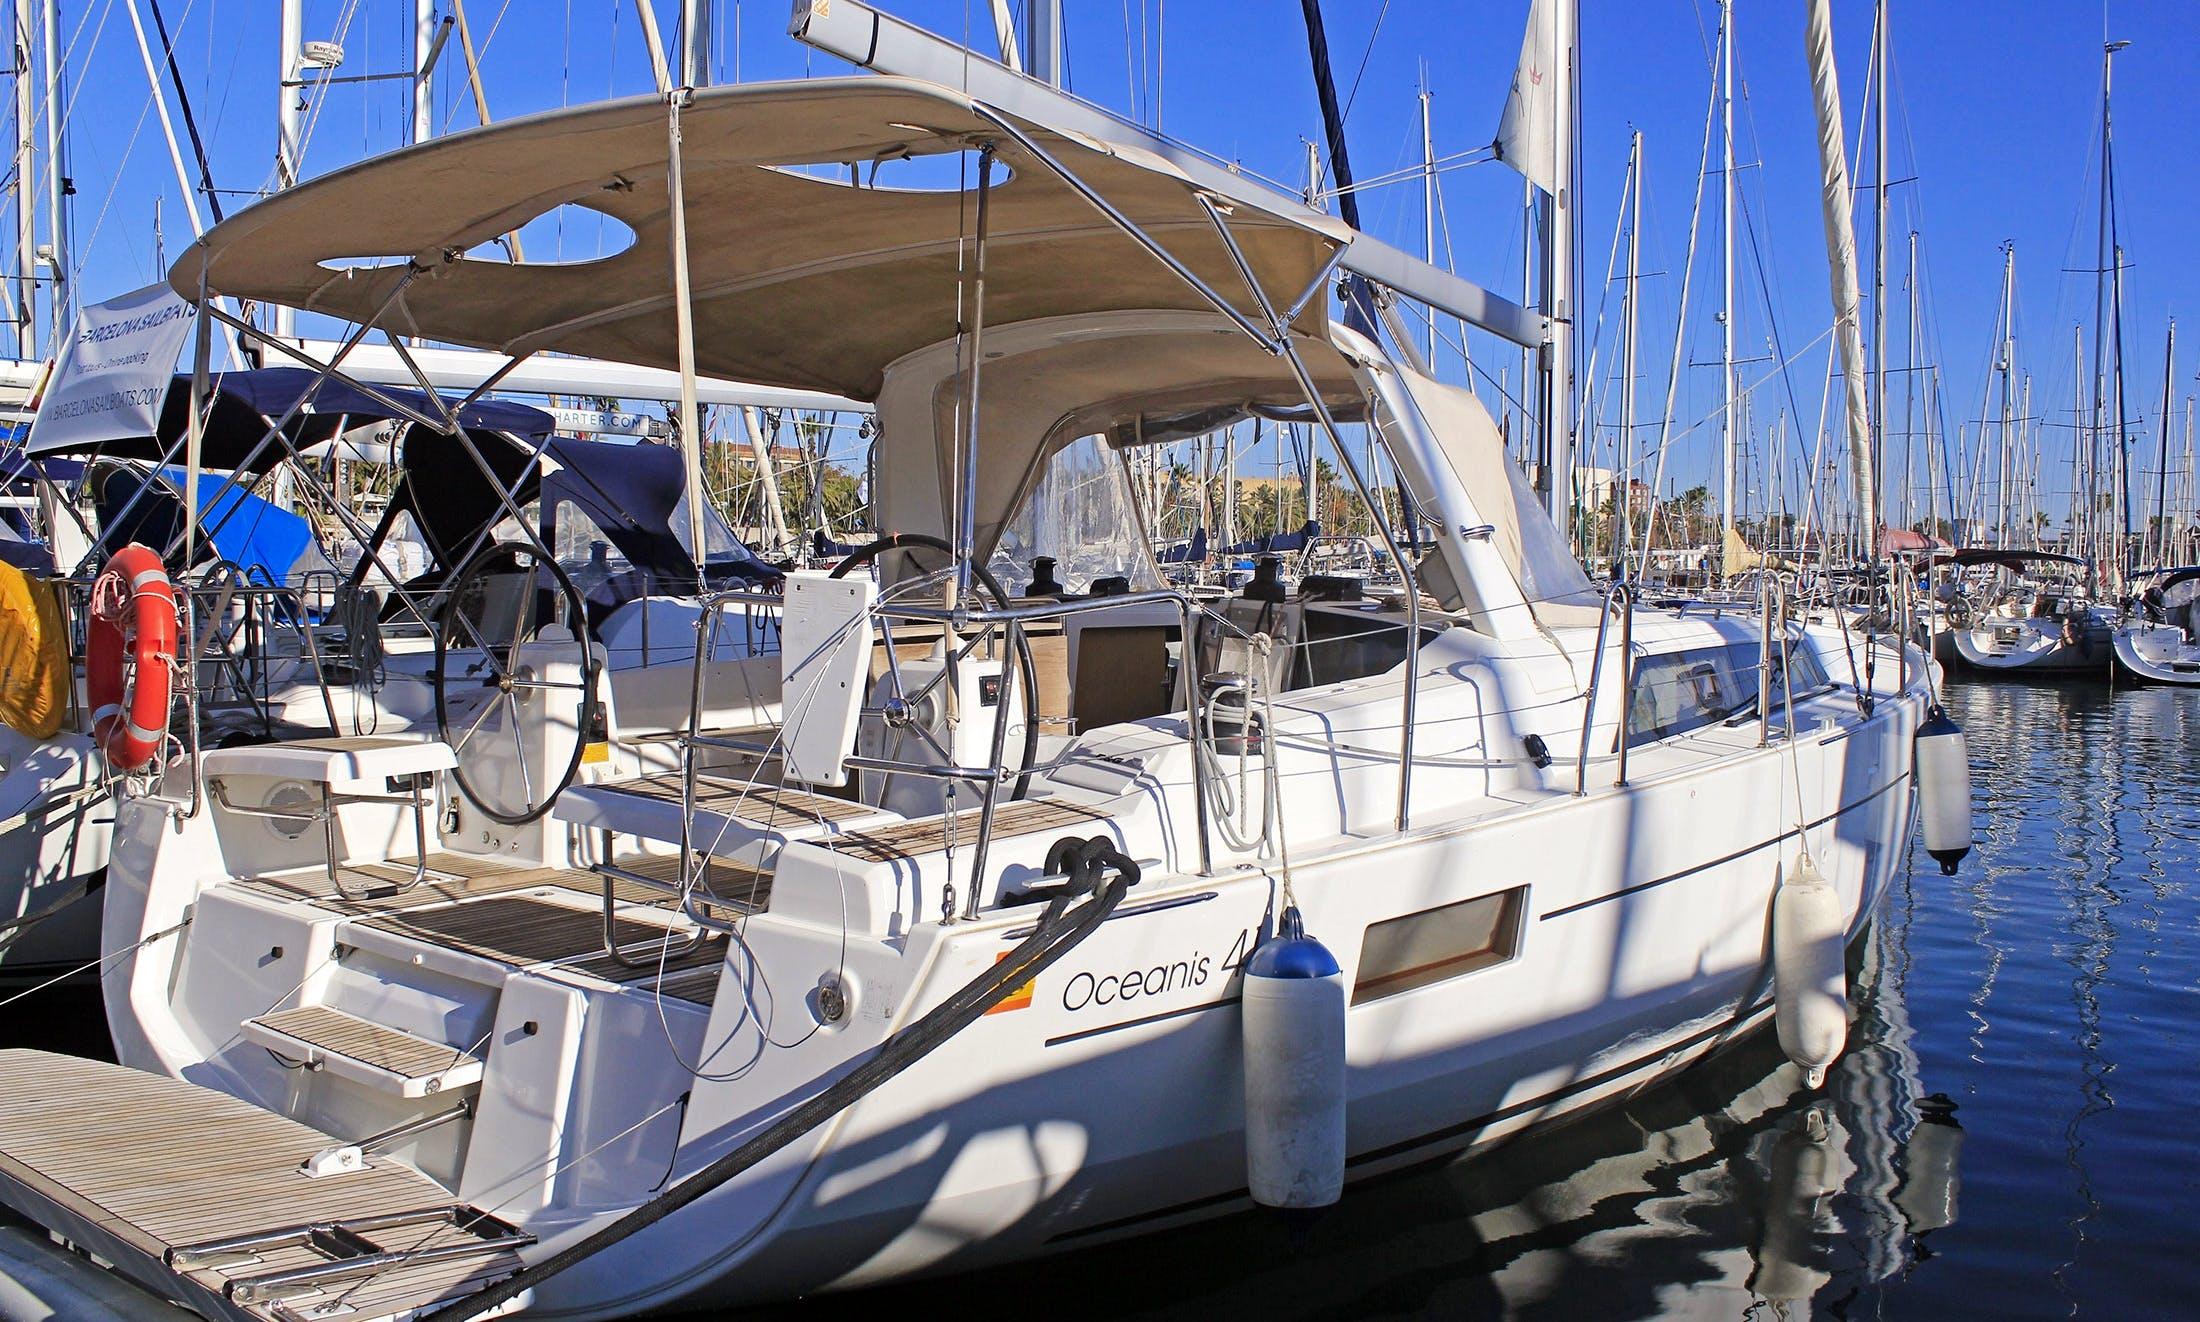 Charter a Beneteau Oceanis 41.1 Sailing Yacht in Mallorca, Spain!